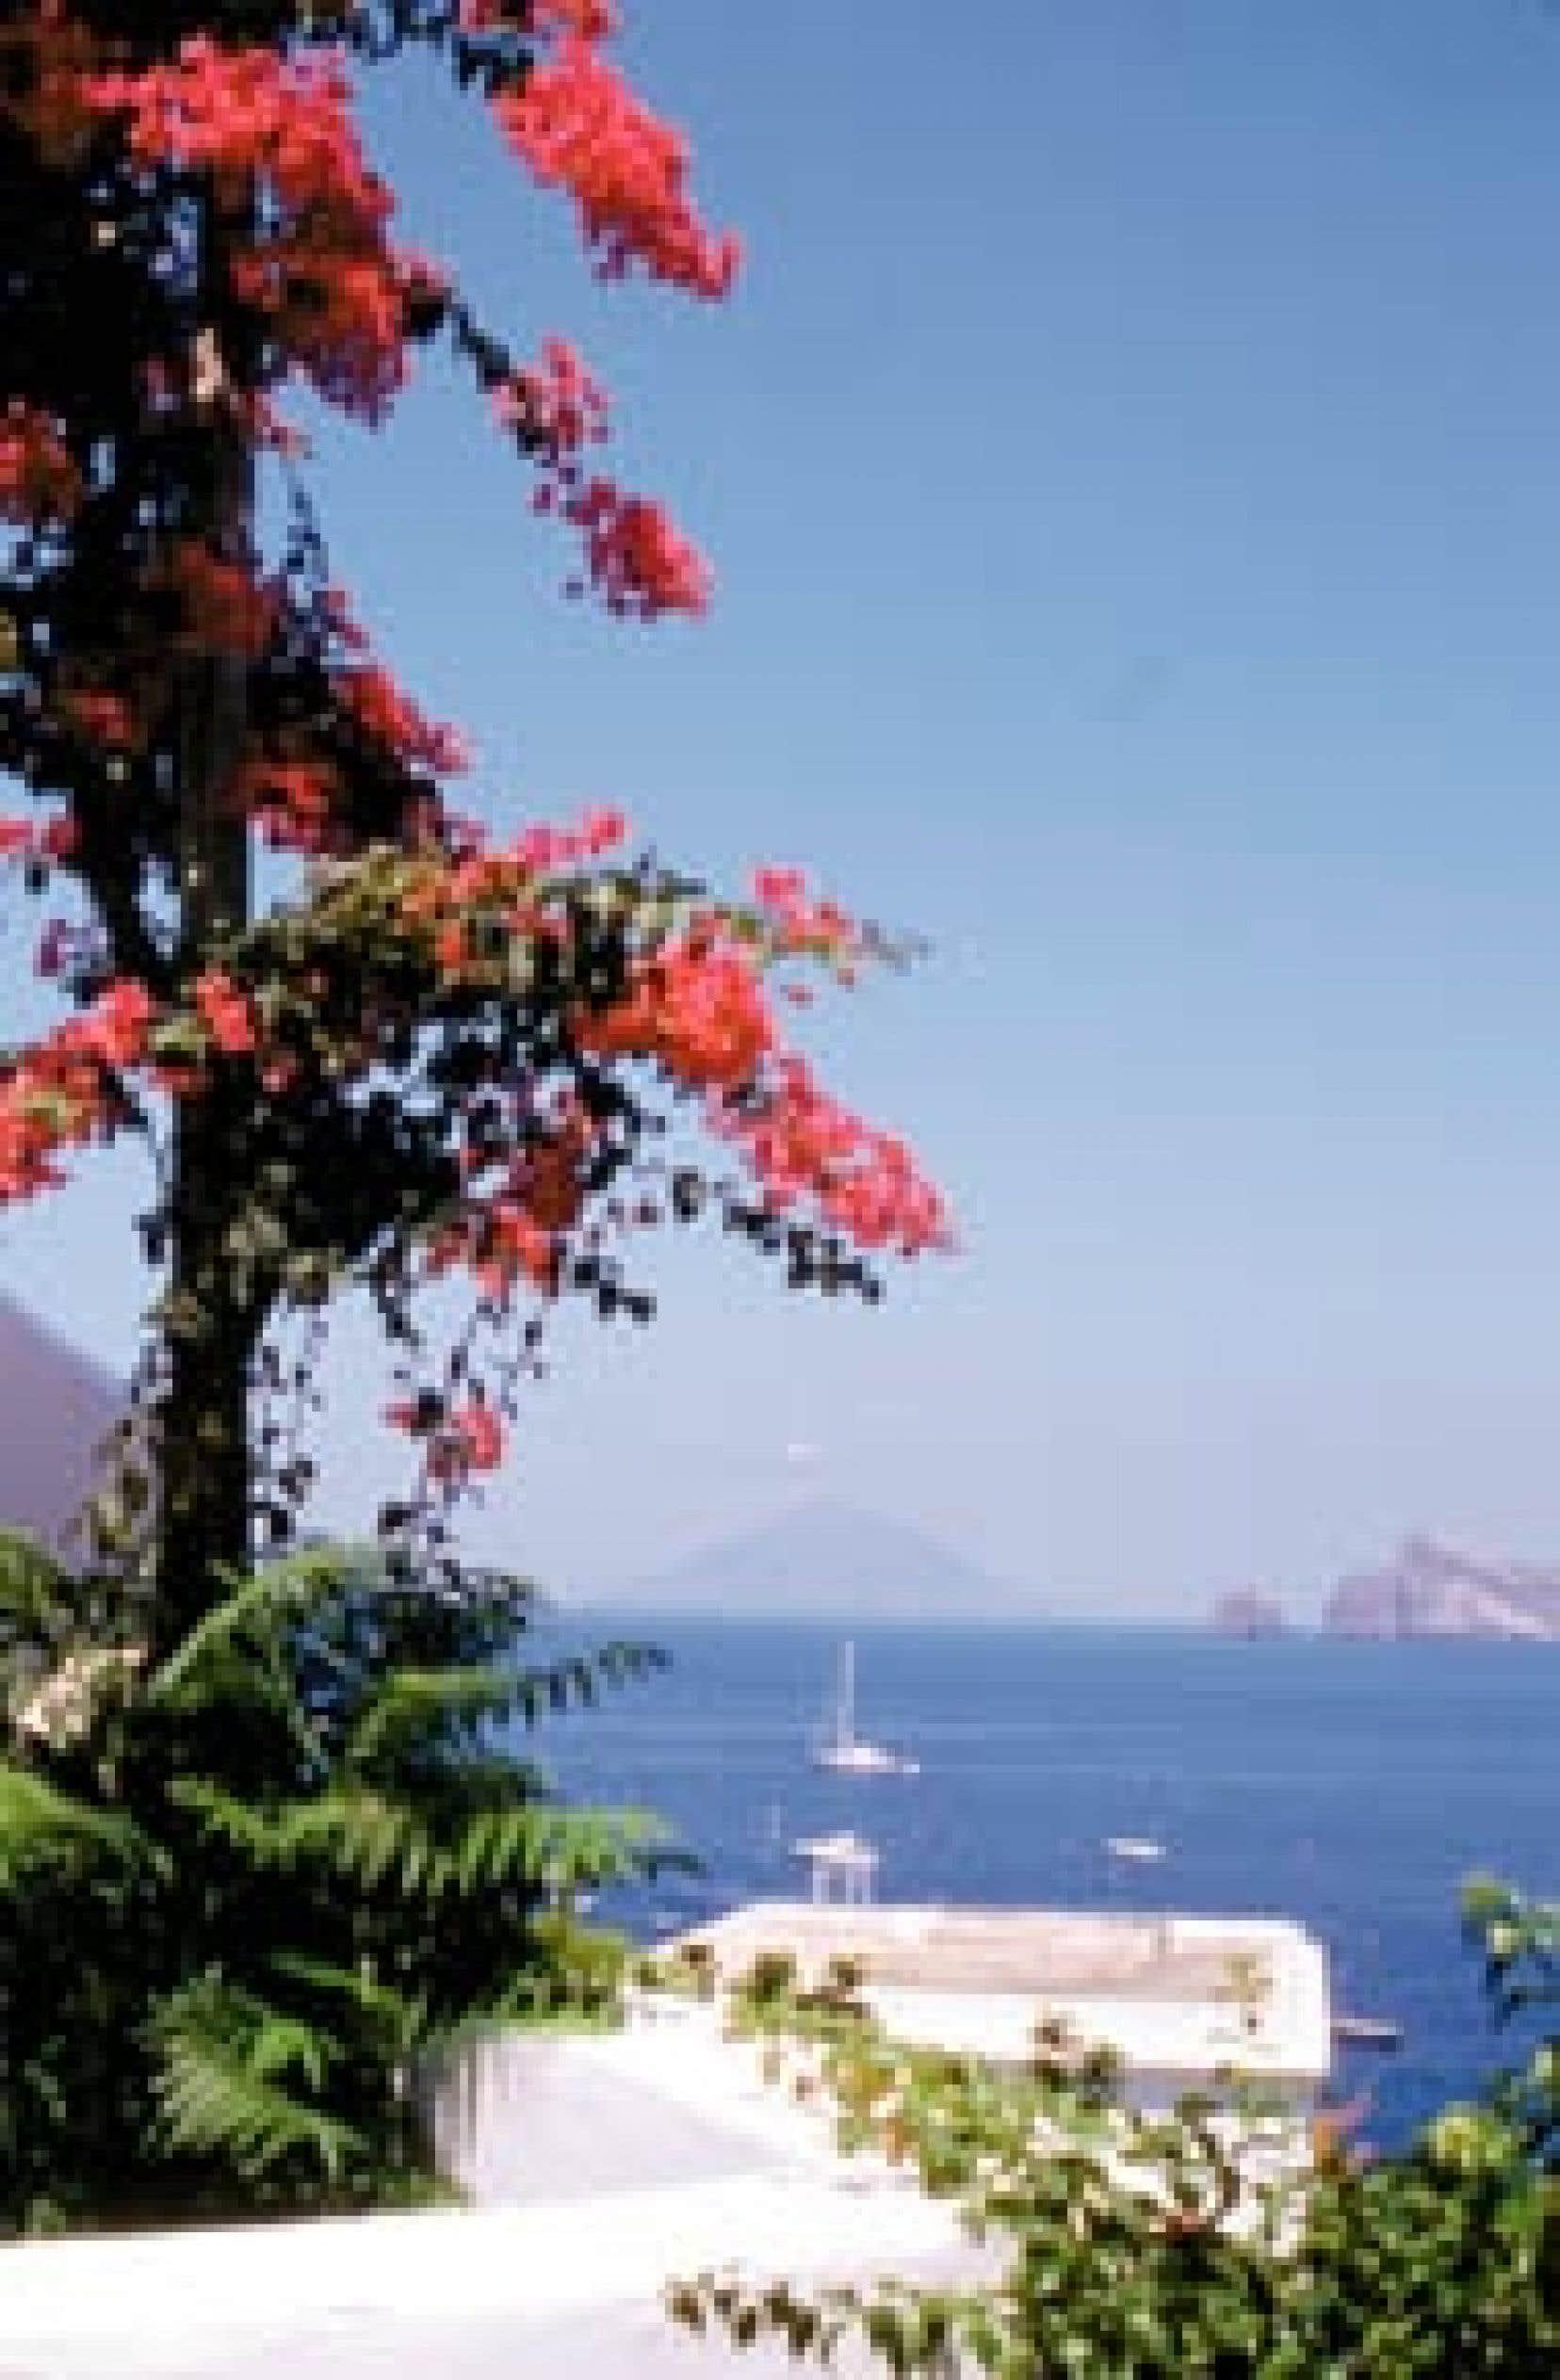 Panarea et, au loin, Stromboli. Photo: Gary Lawrence